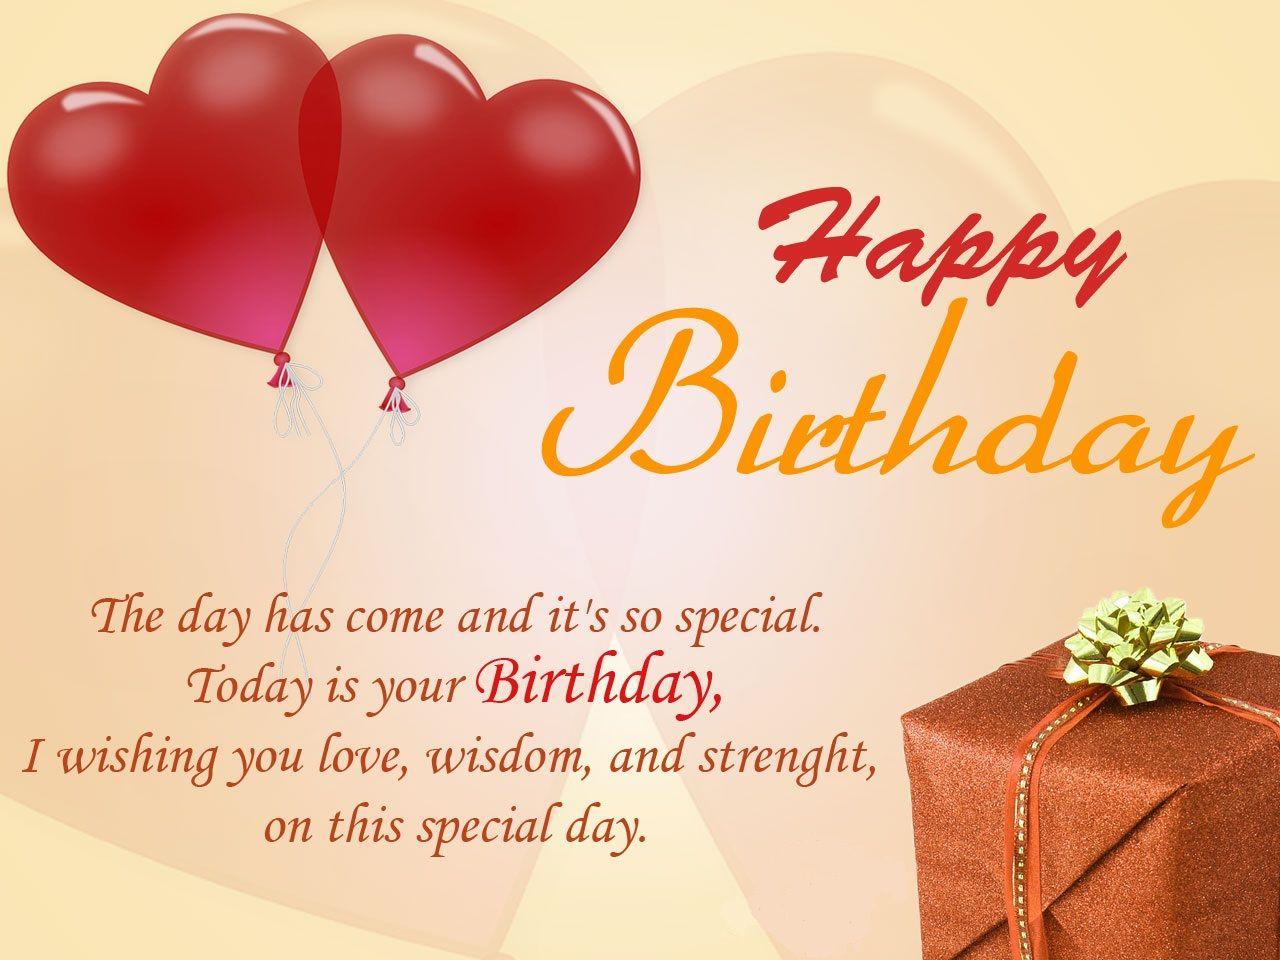 Happy Birthday Wishes Messages Birthday Pinterest Happy Happy Birthday Wishes Message